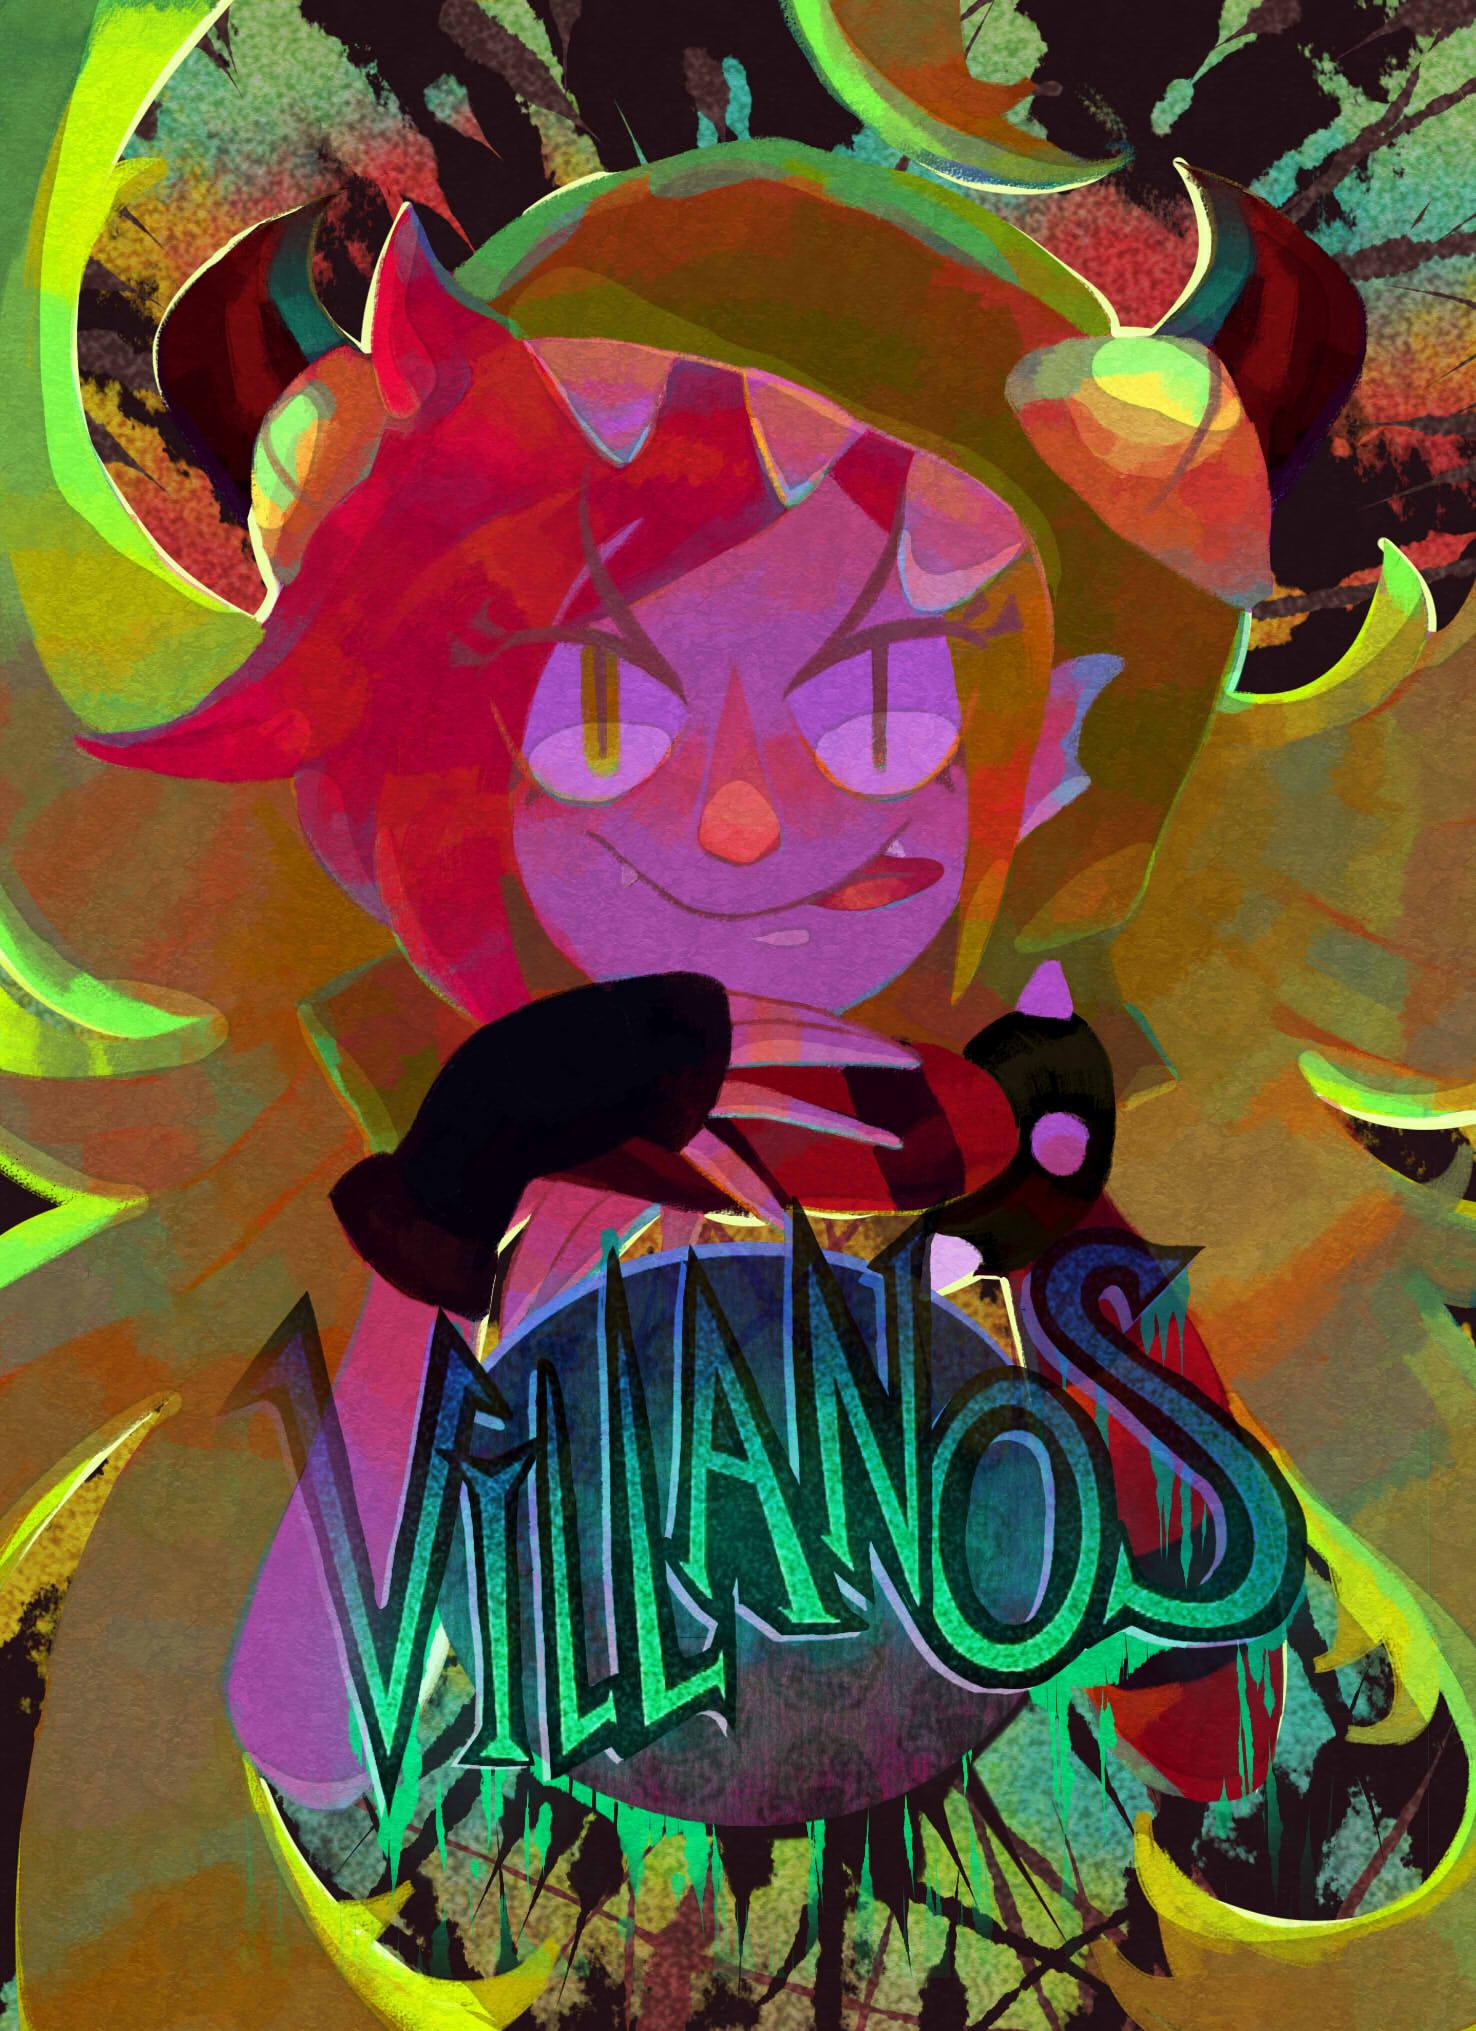 Demencia - Villainous - Zerochan Anime Image Board